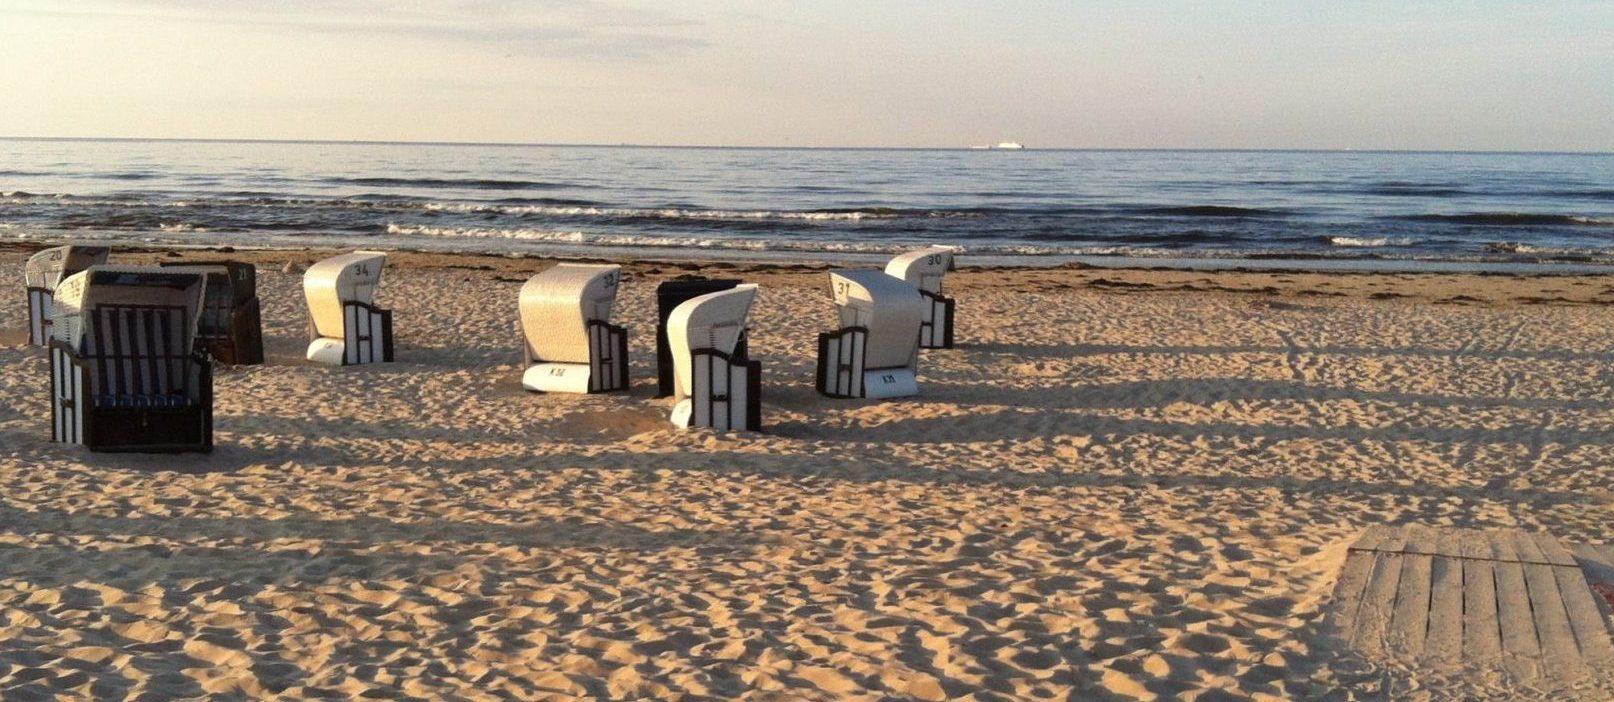 Strandkörbe am Strand von Ahlbeck, Usedom